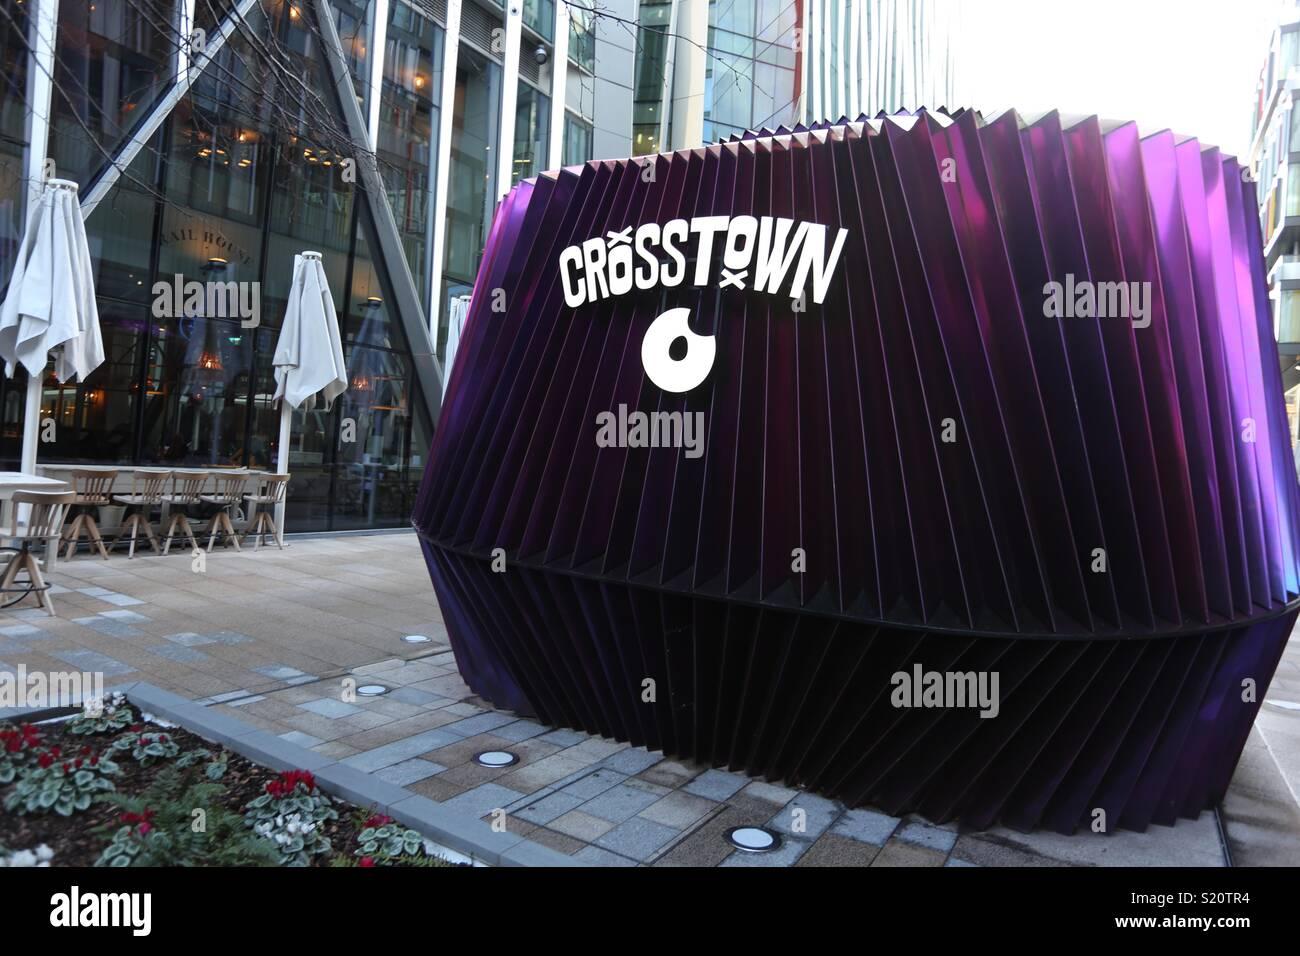 Crosstown Doughnuts - Stock Image